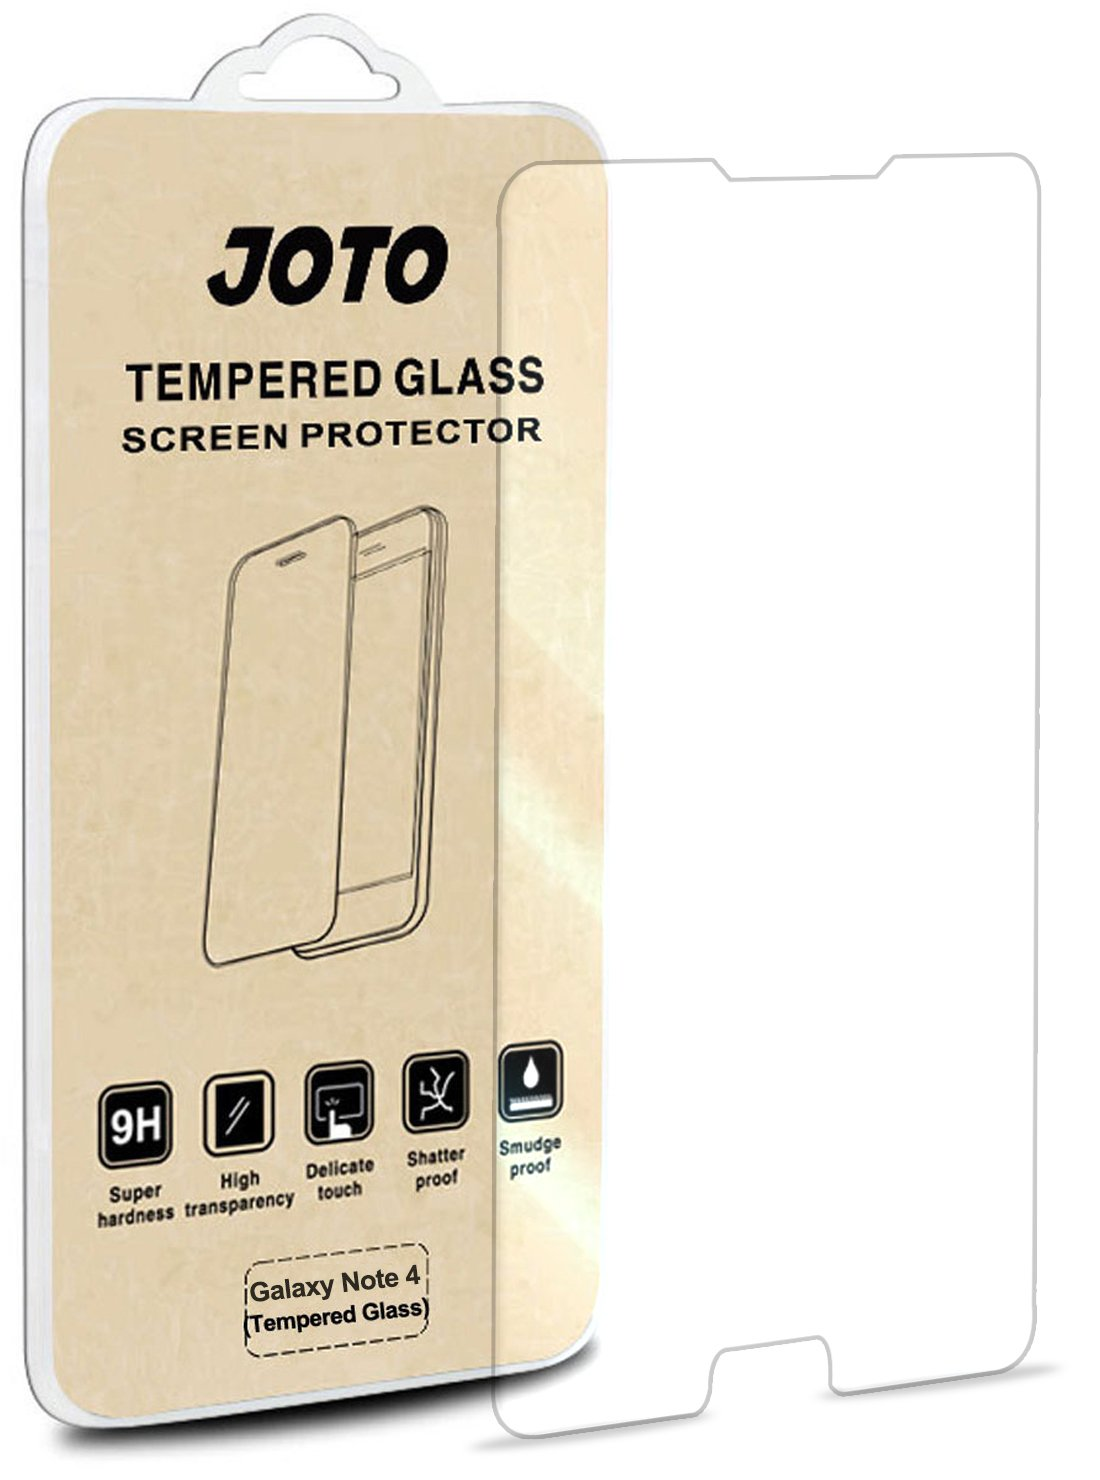 Vidrio De Privacidad para Samsung Note 4 JOTO (0OTB86B6)